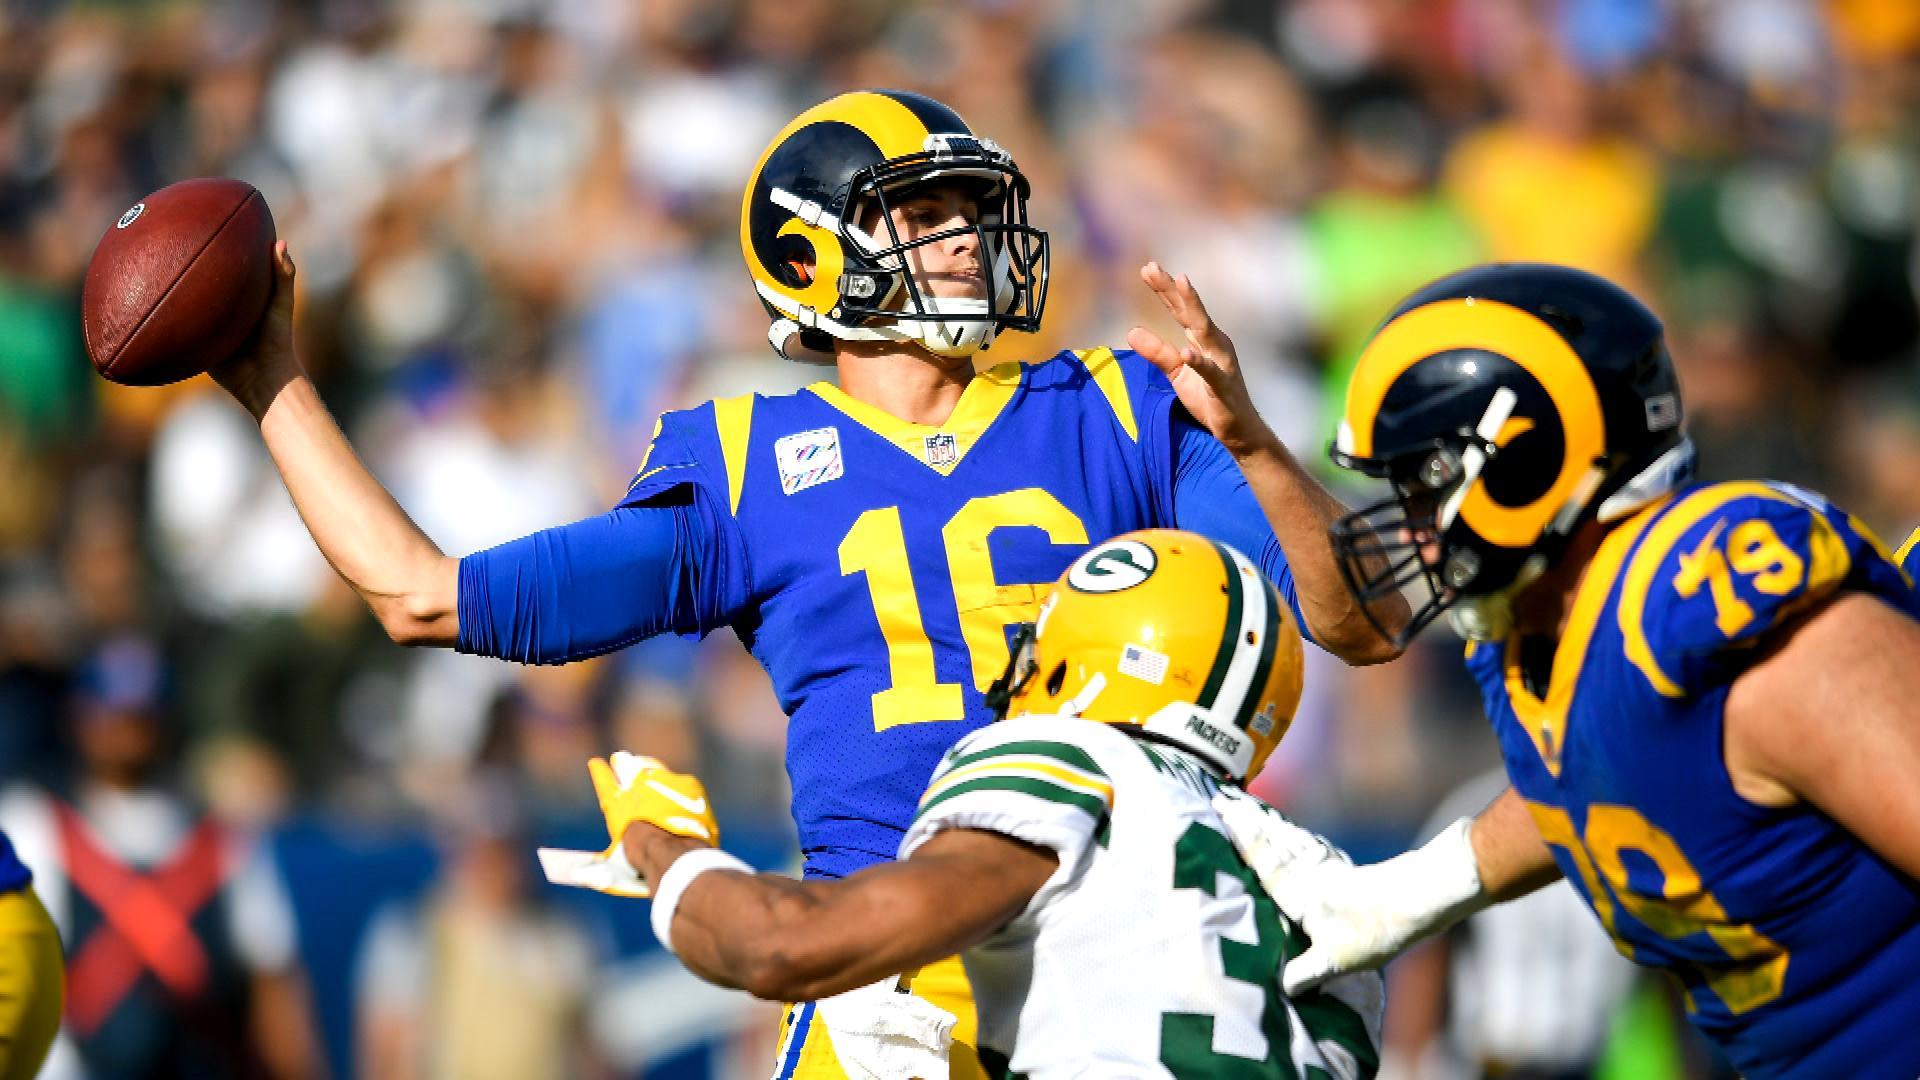 Cowboys' Dak Prescott vs. Rams' Jared Goff: Who ya got?